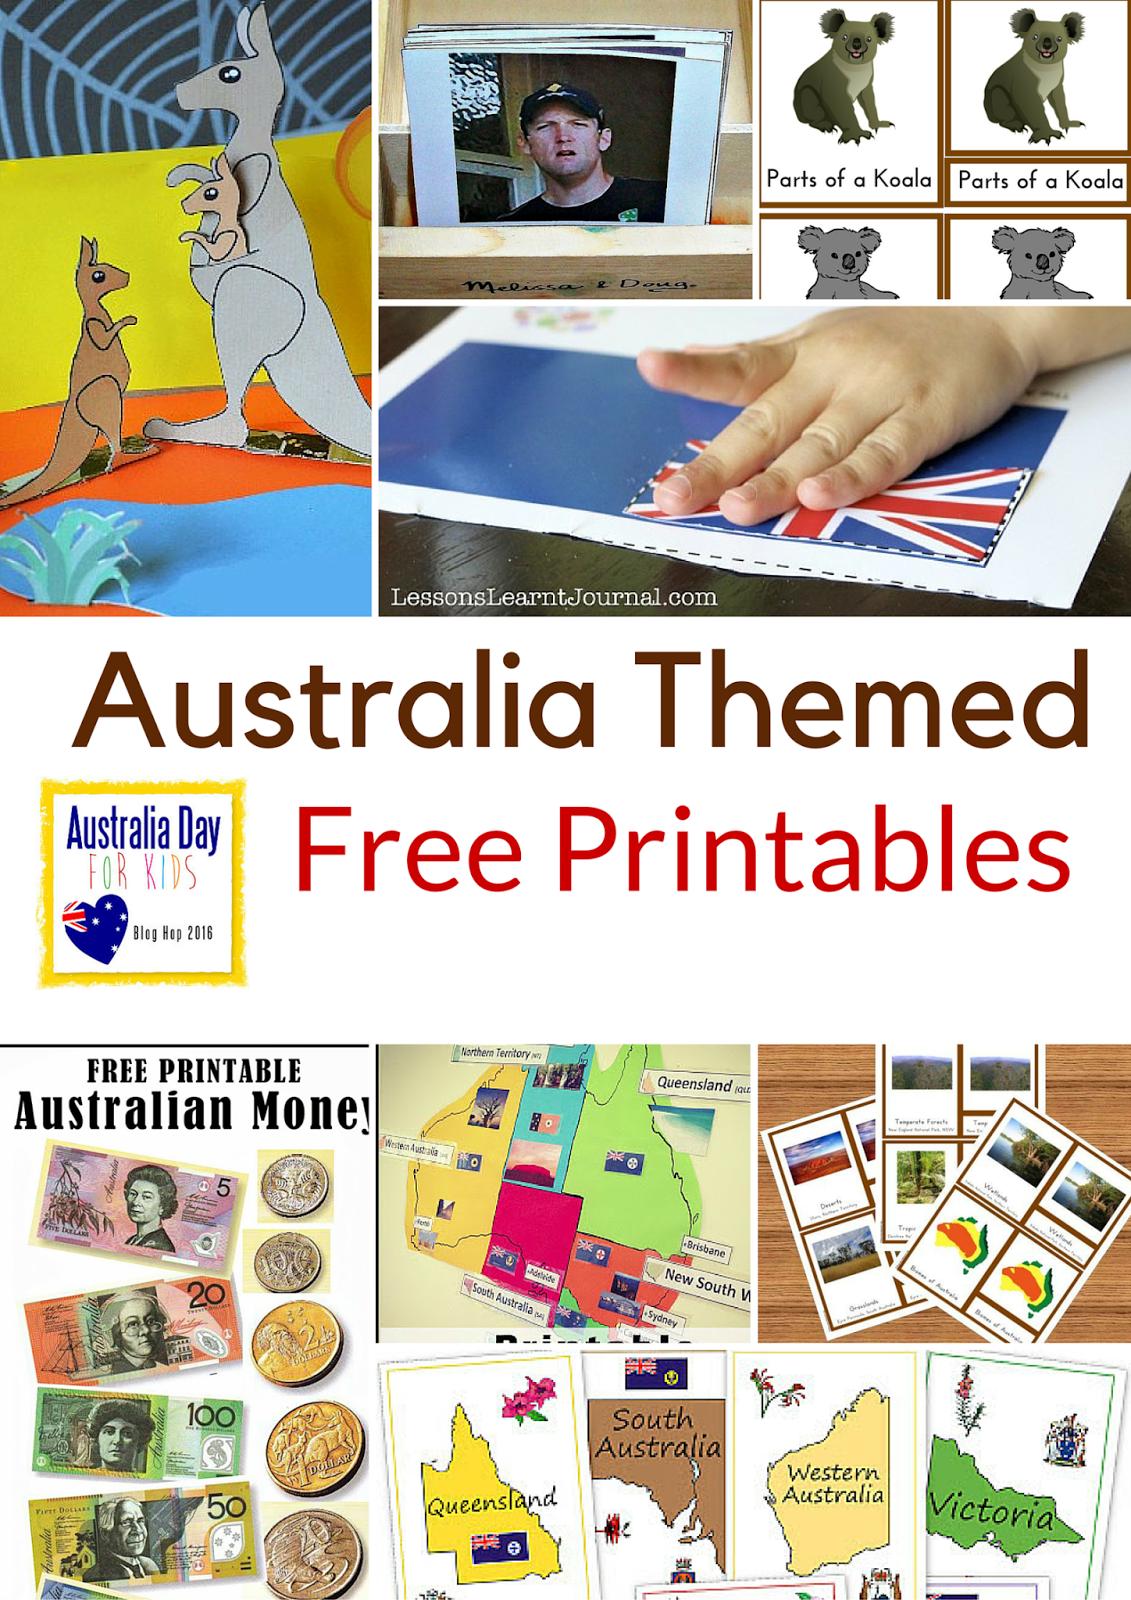 Australia Themed Free Printables